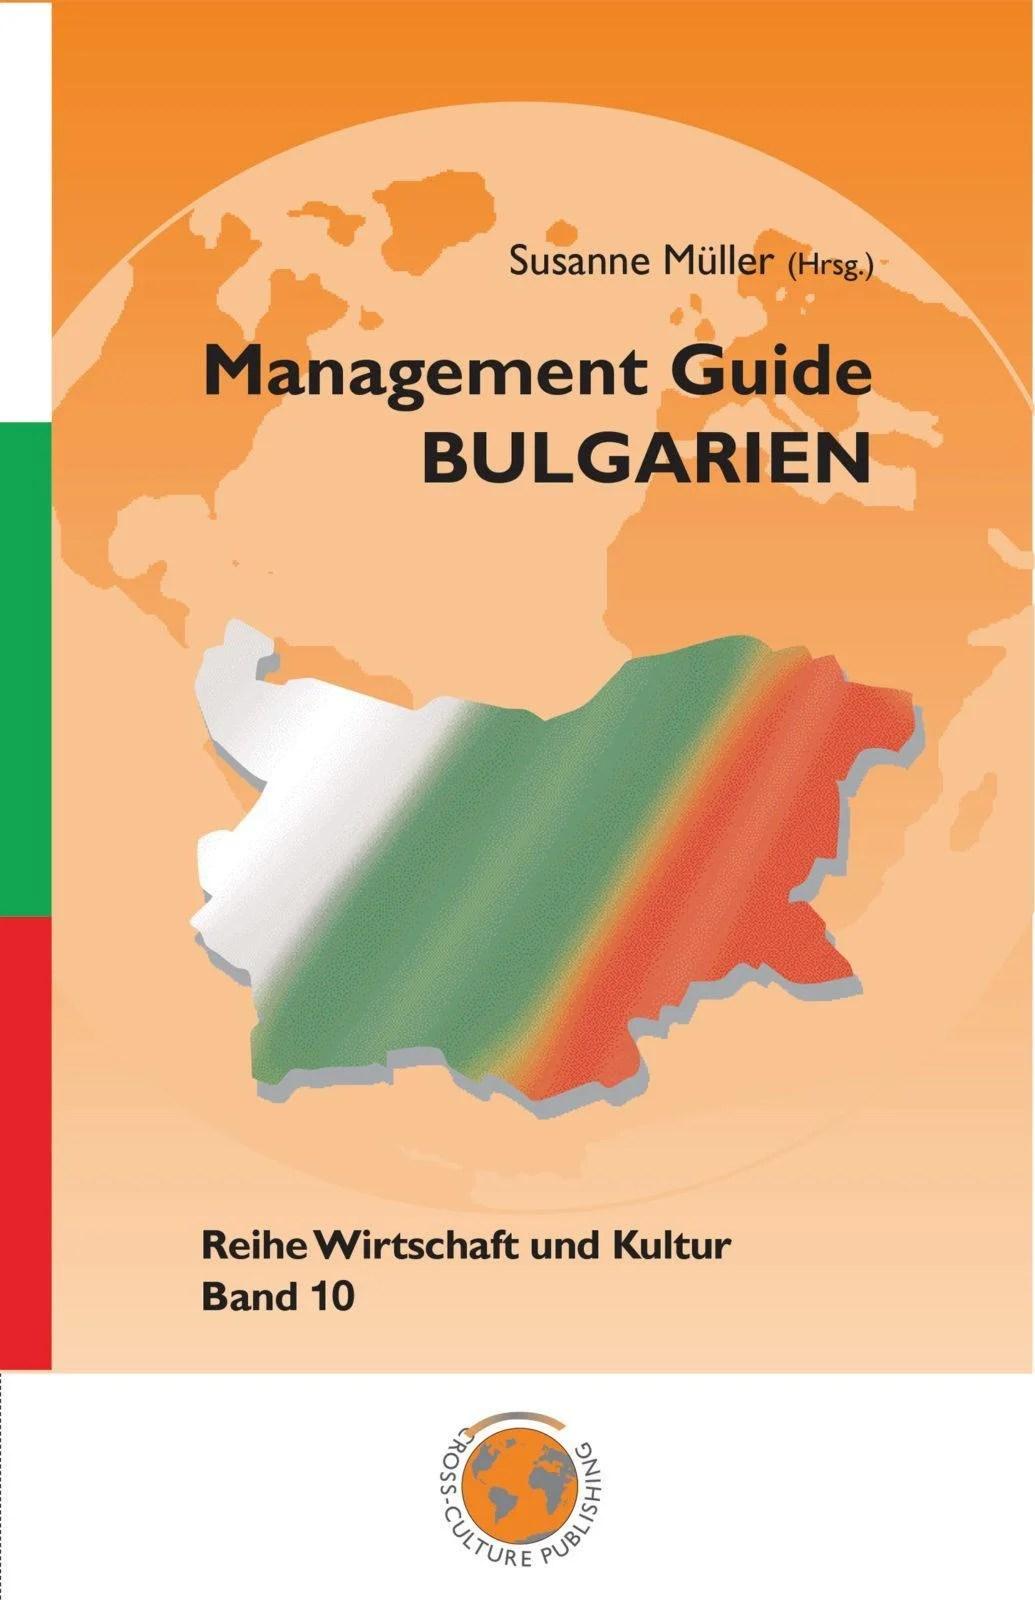 Management Guide Bulgaria